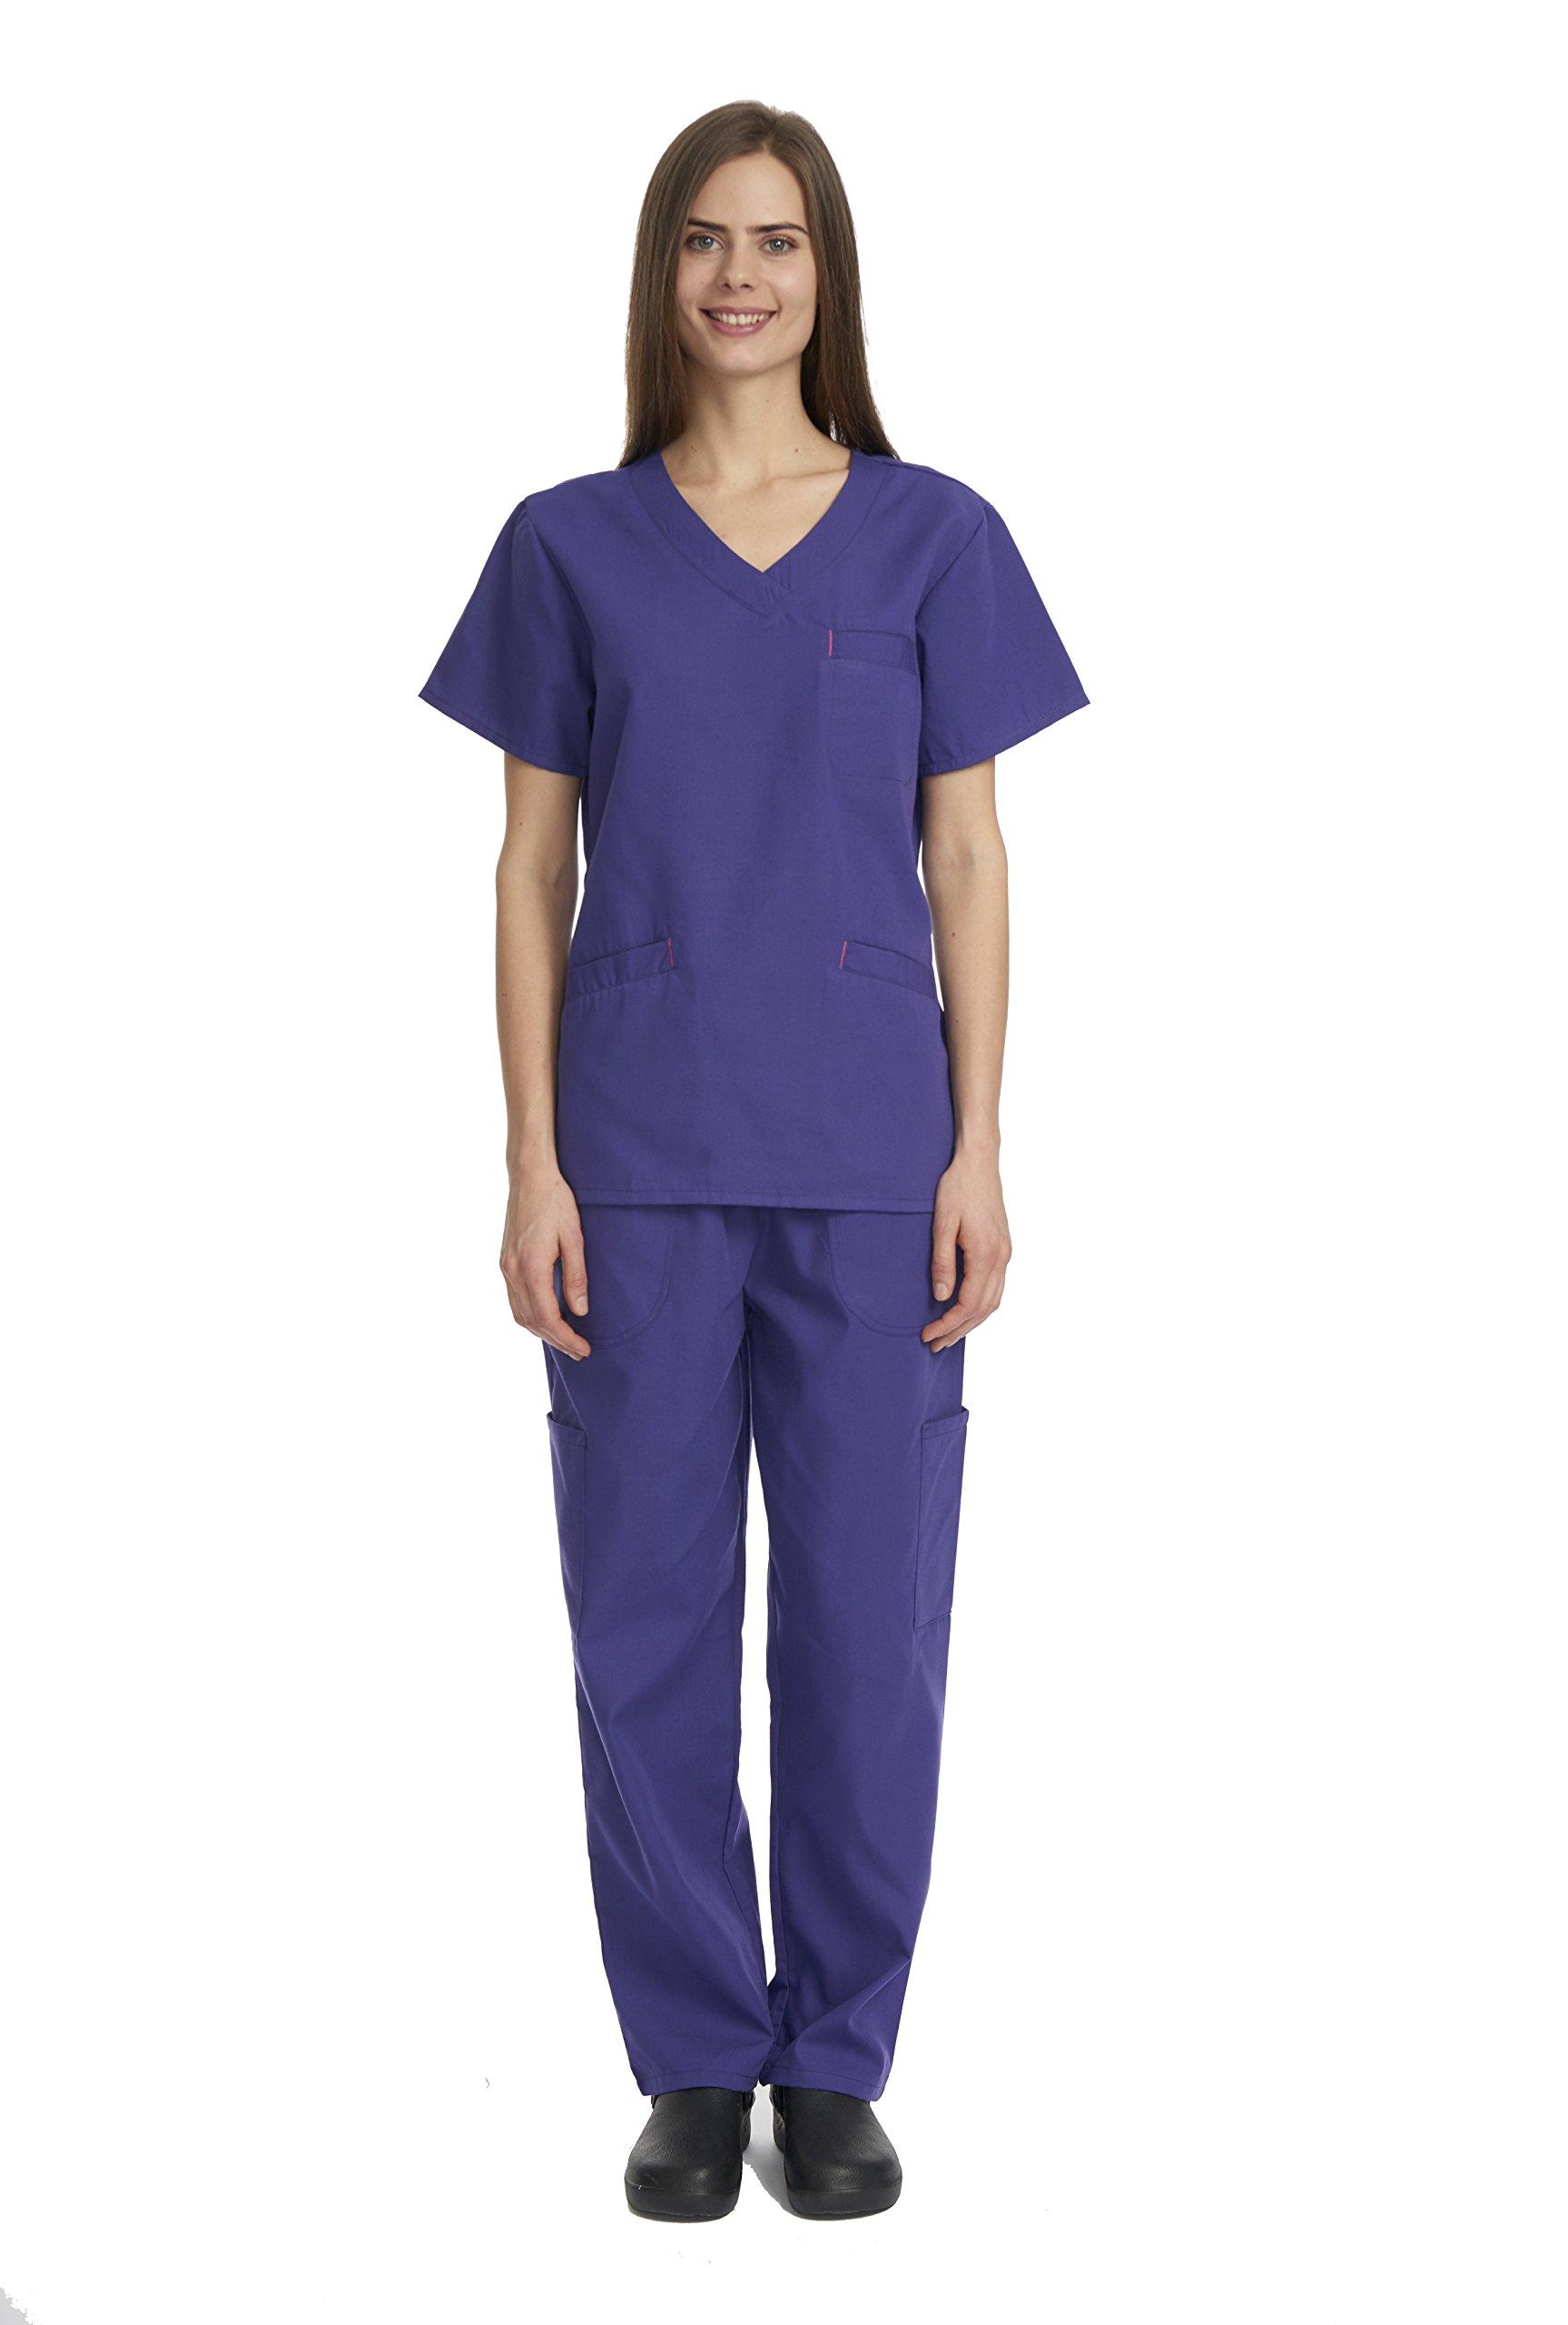 Denice Womens Scrub Sets/Multiple Pockets/Medical Uniforms 1050 (Medium, Grape)